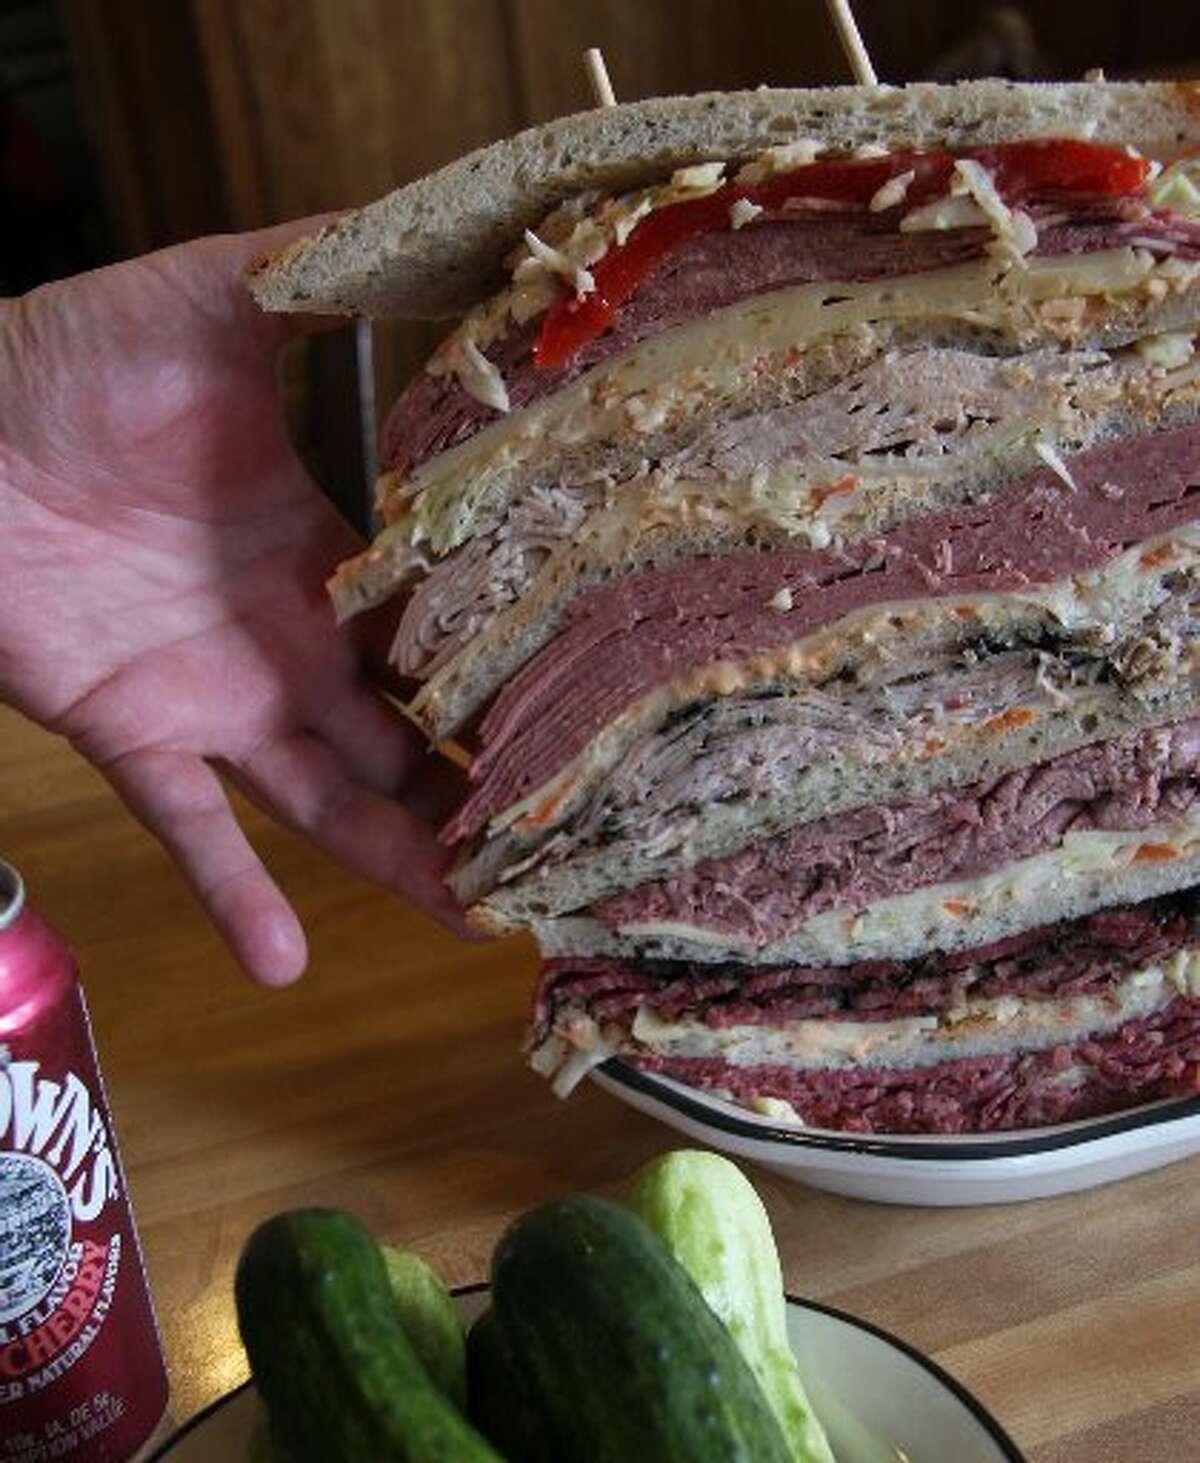 The Zellagabetsky sandwich from Kenny & Ziggy's.